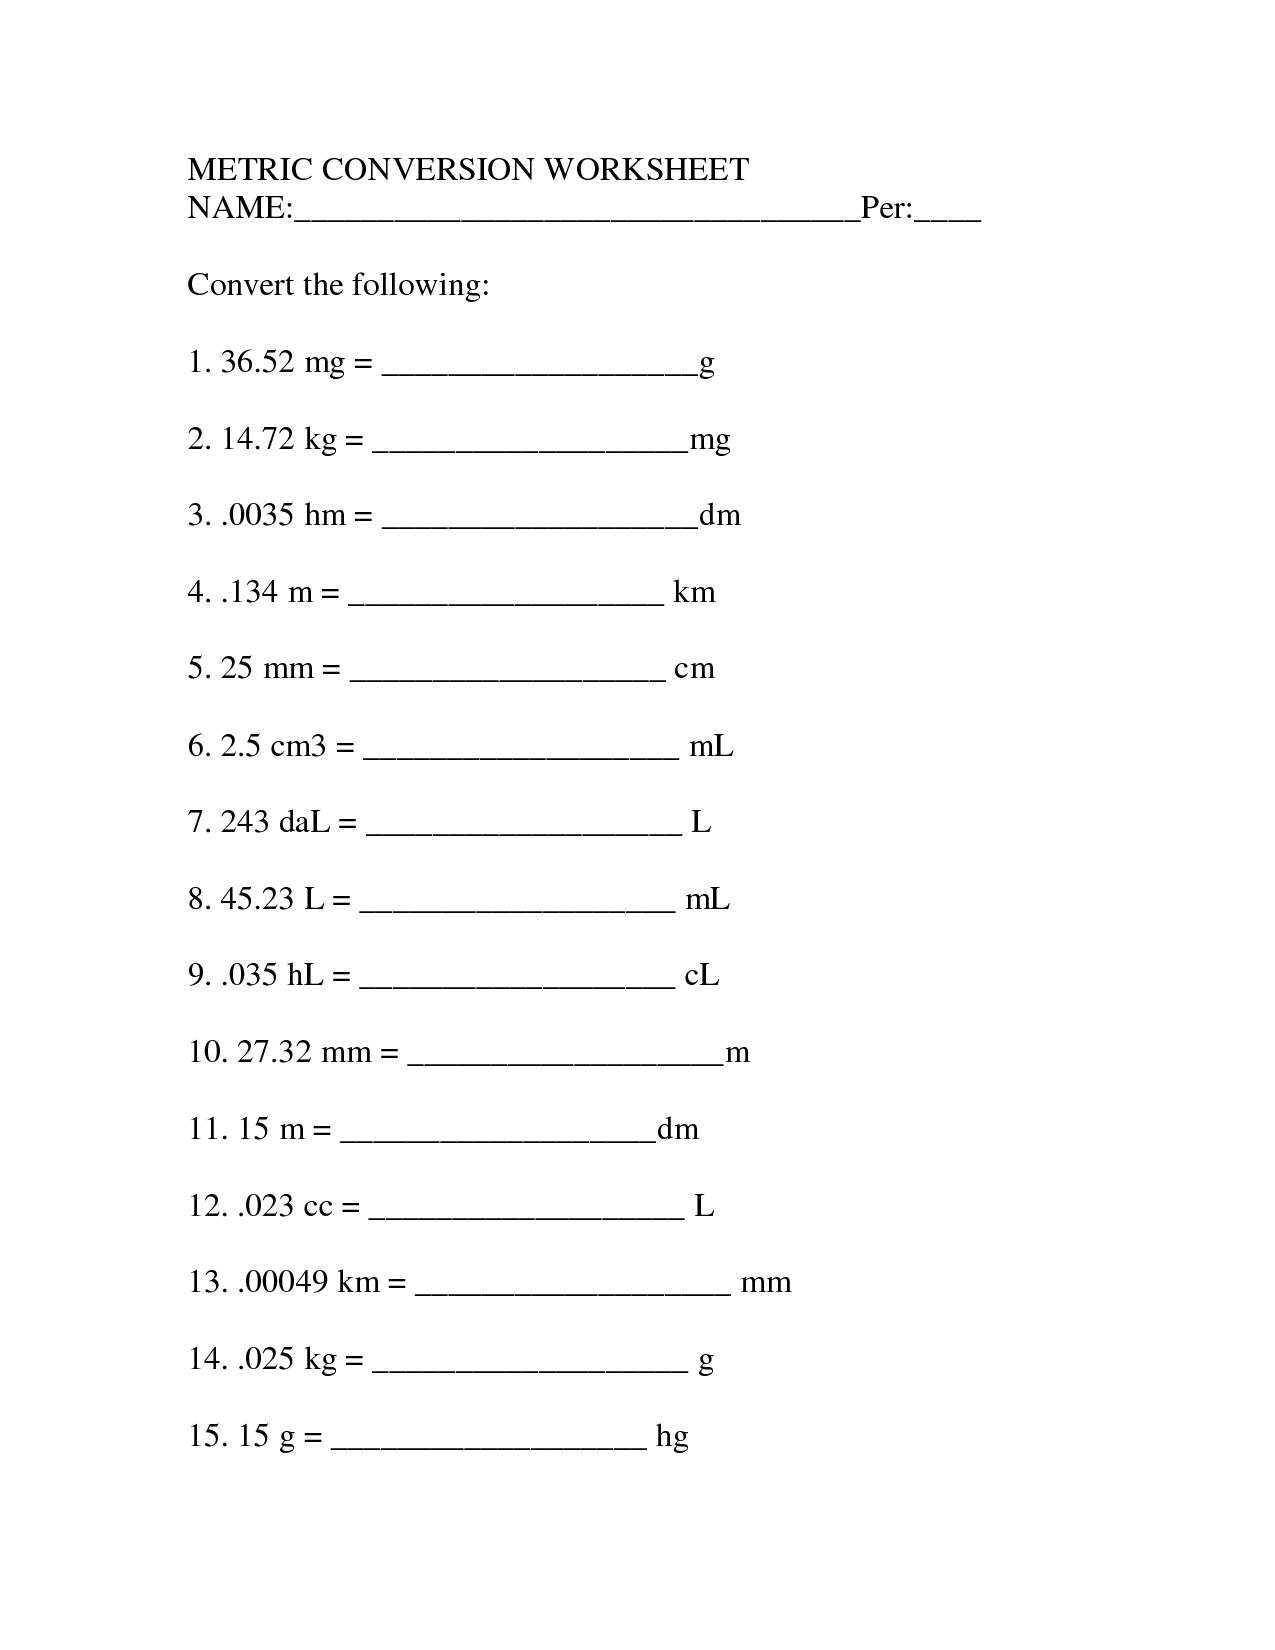 16 Best Images Of Measurement Conversion Worksheets 5th Grade